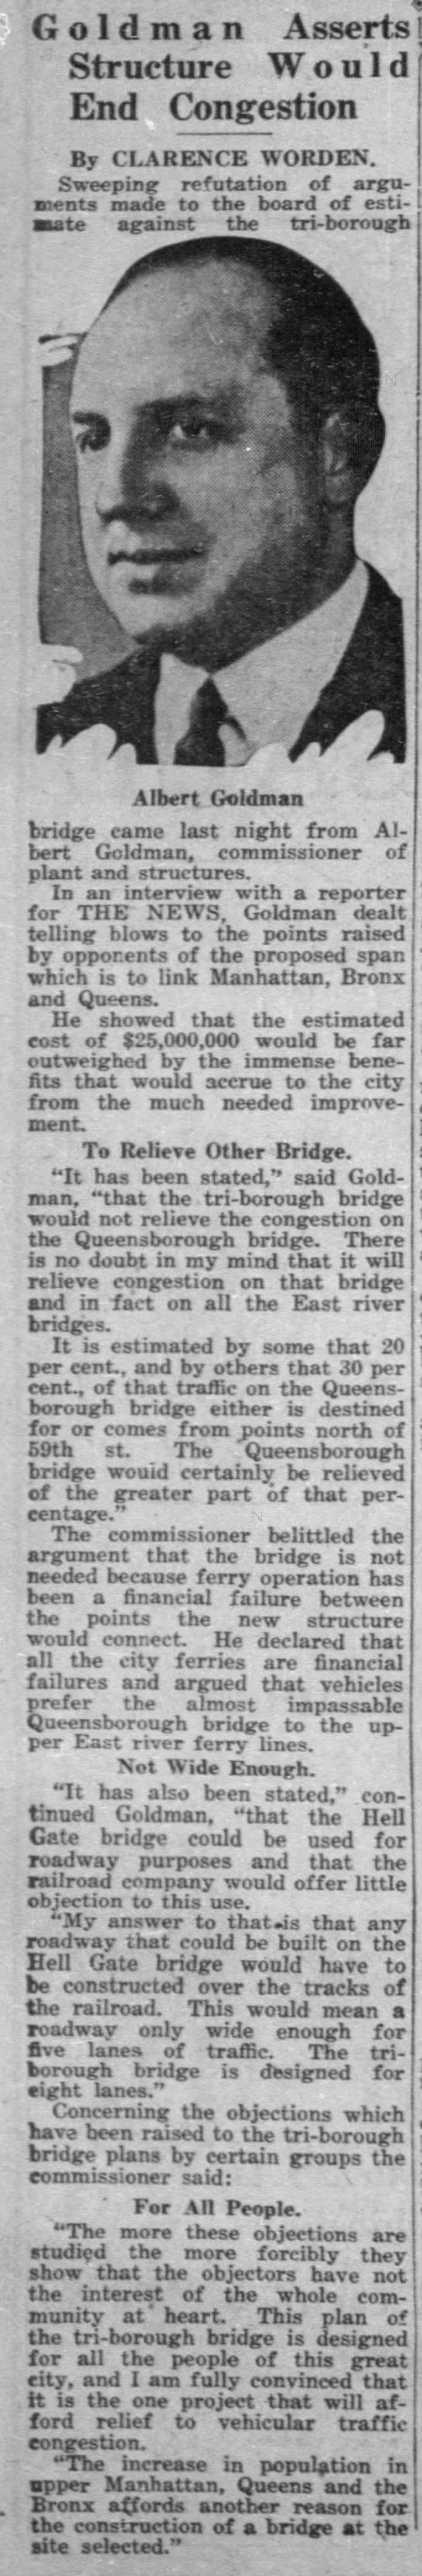 Triborough Bridge Objections Refuted -